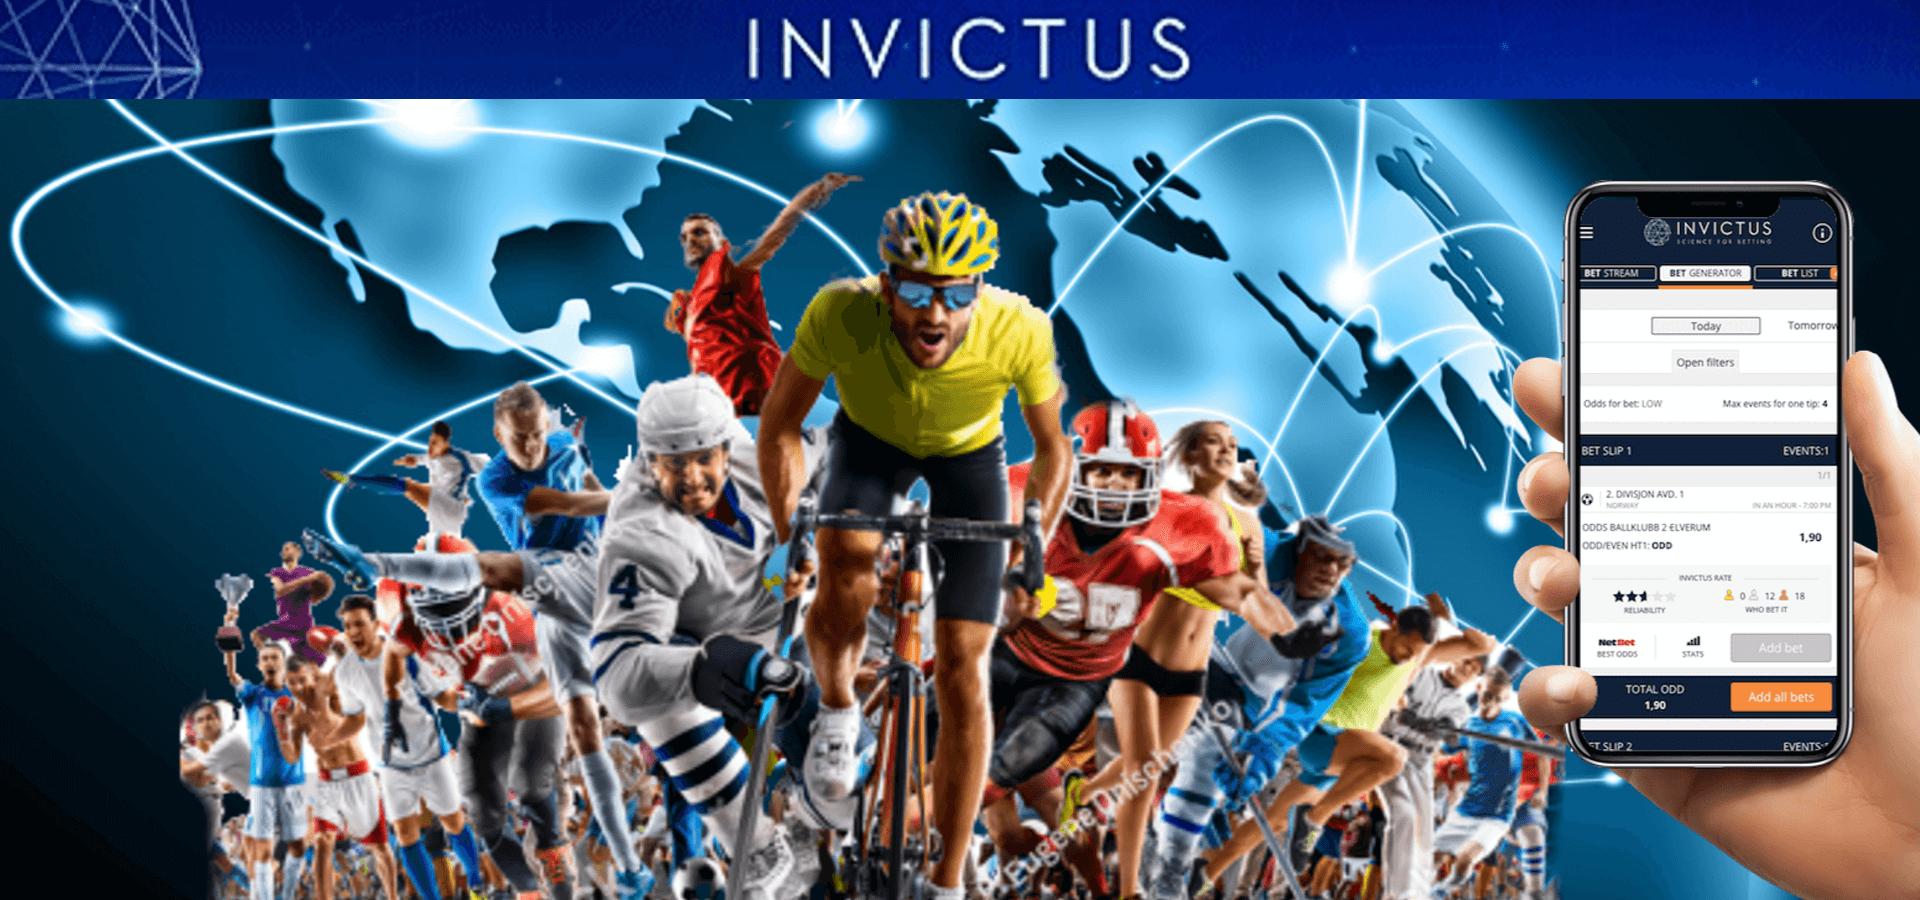 Pronostici vincenti Invictus